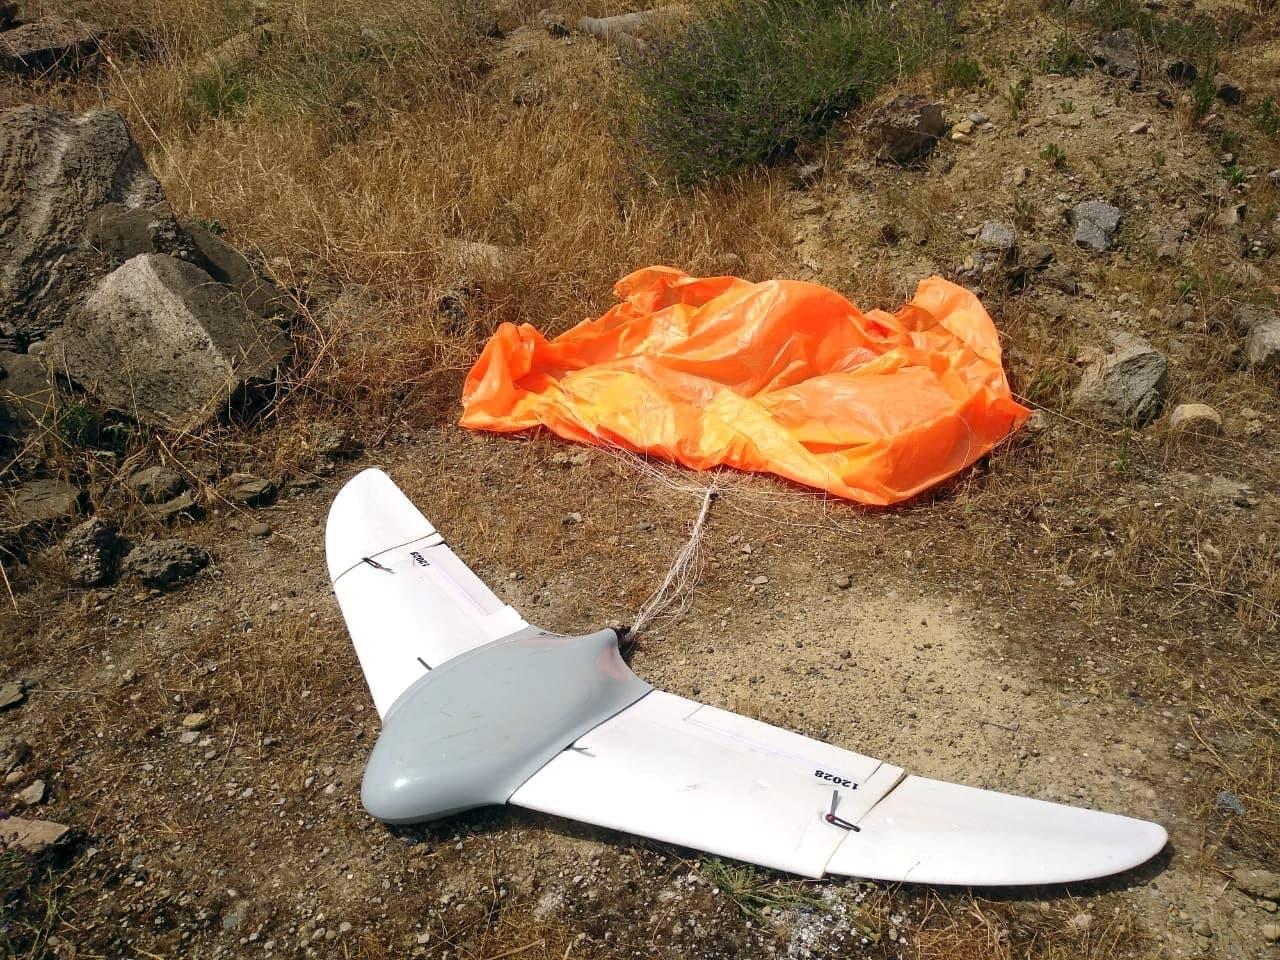 No Calm In Nagorno-Karabakh: Azerbaijani Forces Intercepted Armenian UAV Over Kalbajar Region (Photos)